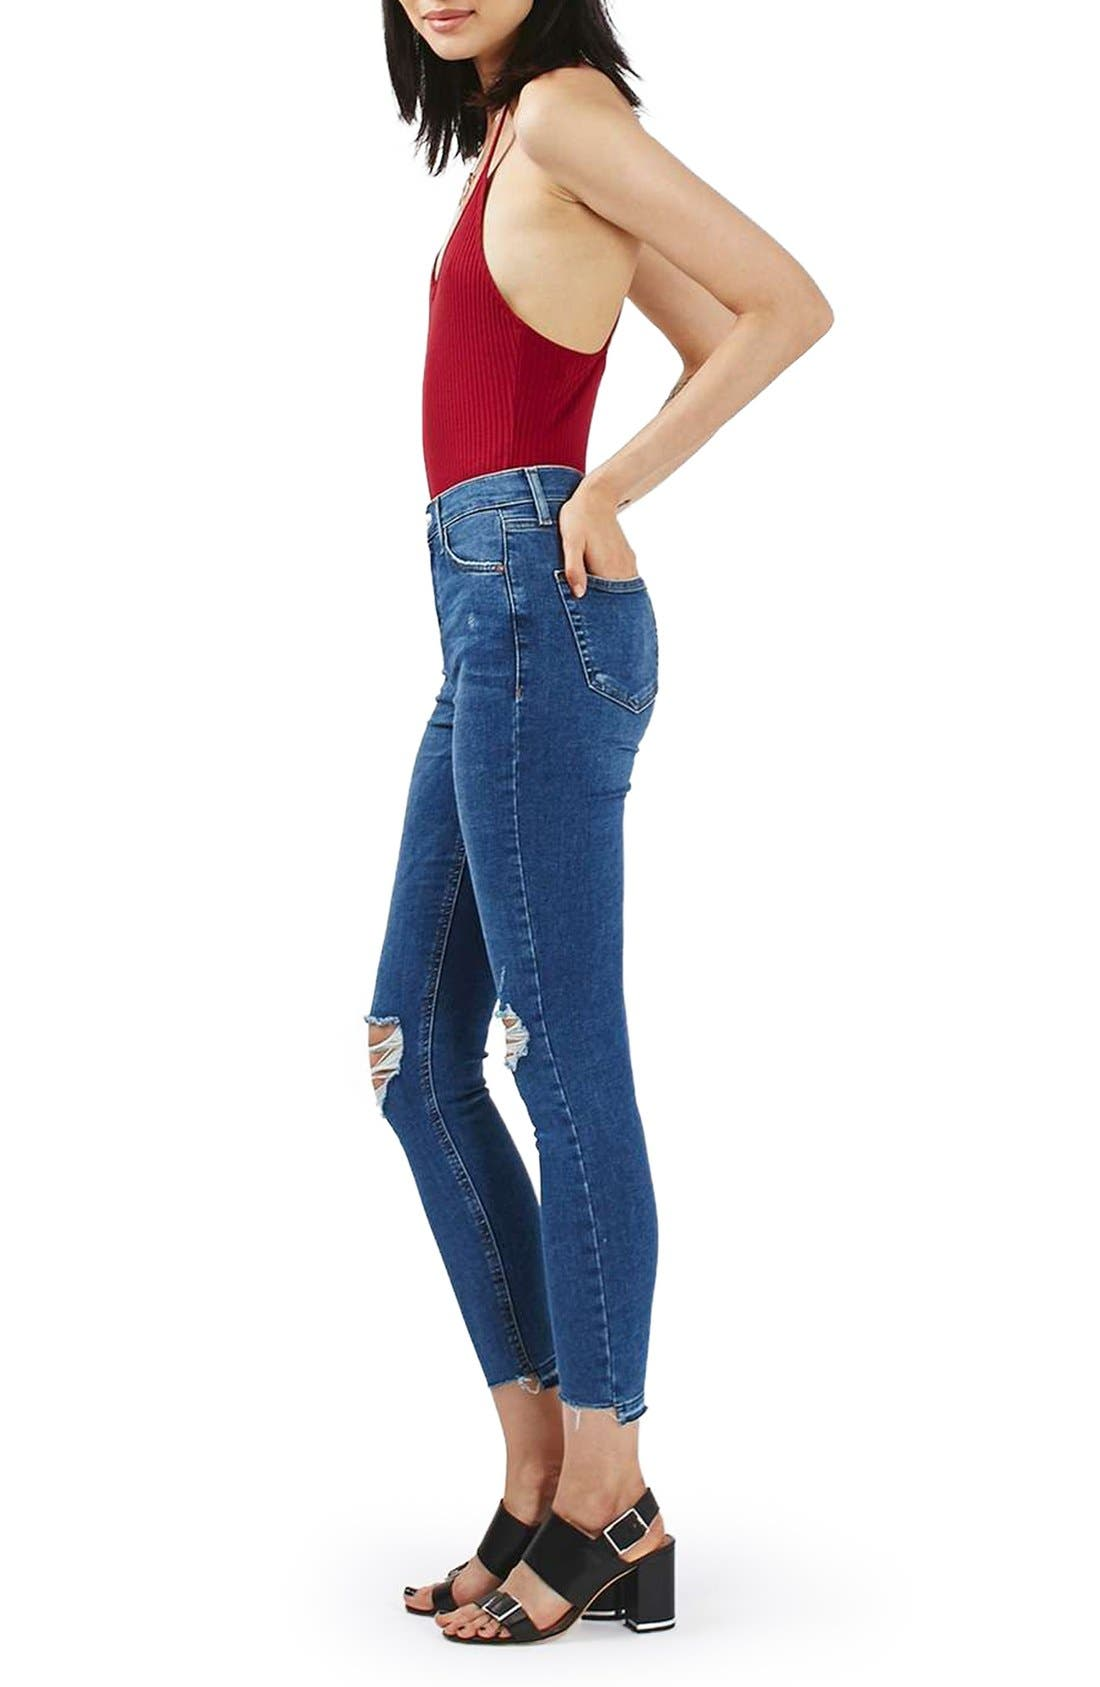 Main Image - Topshp Cross Back Plunge Bodysuit (Petite)